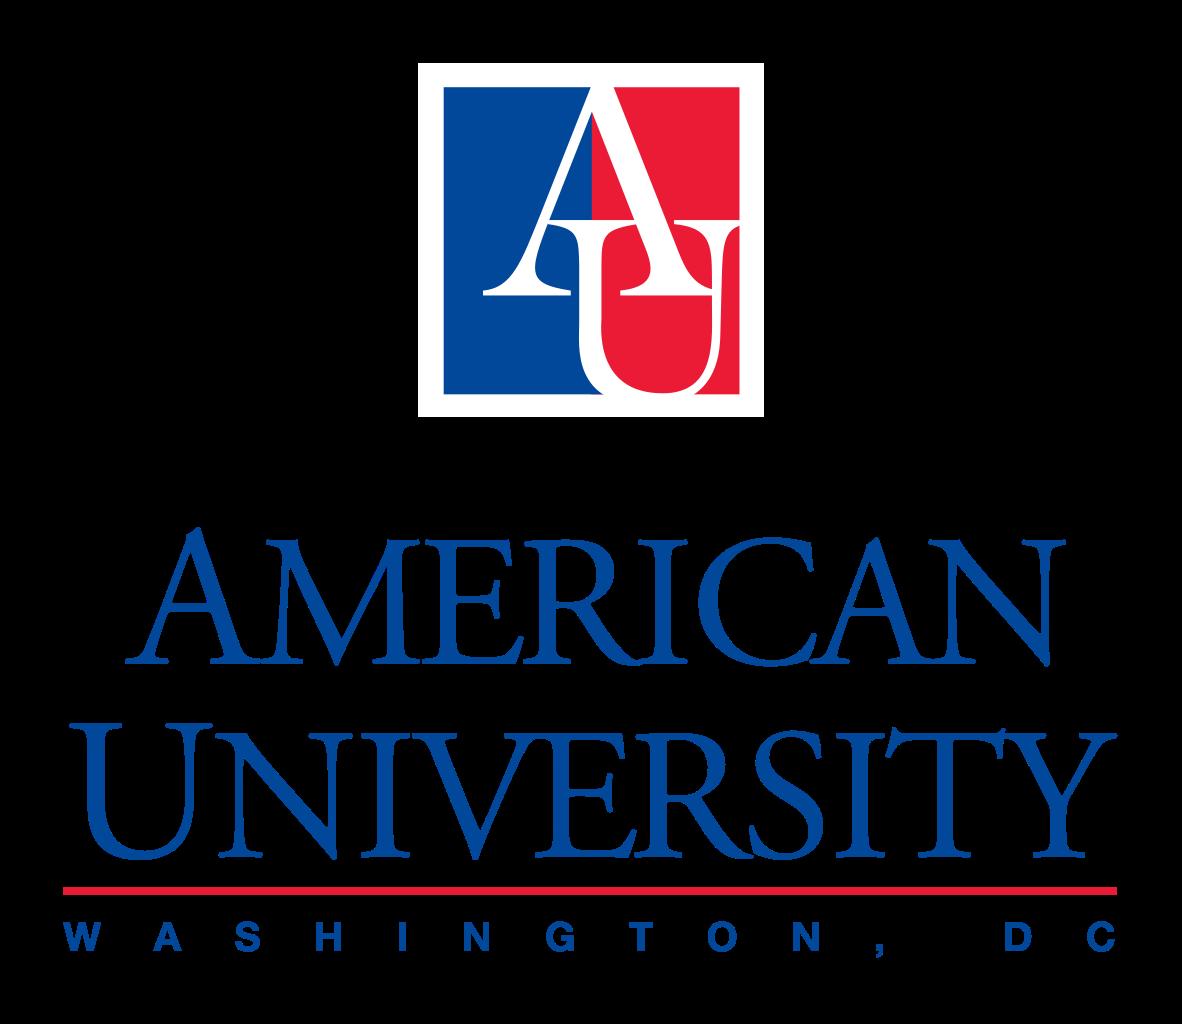 2. American University